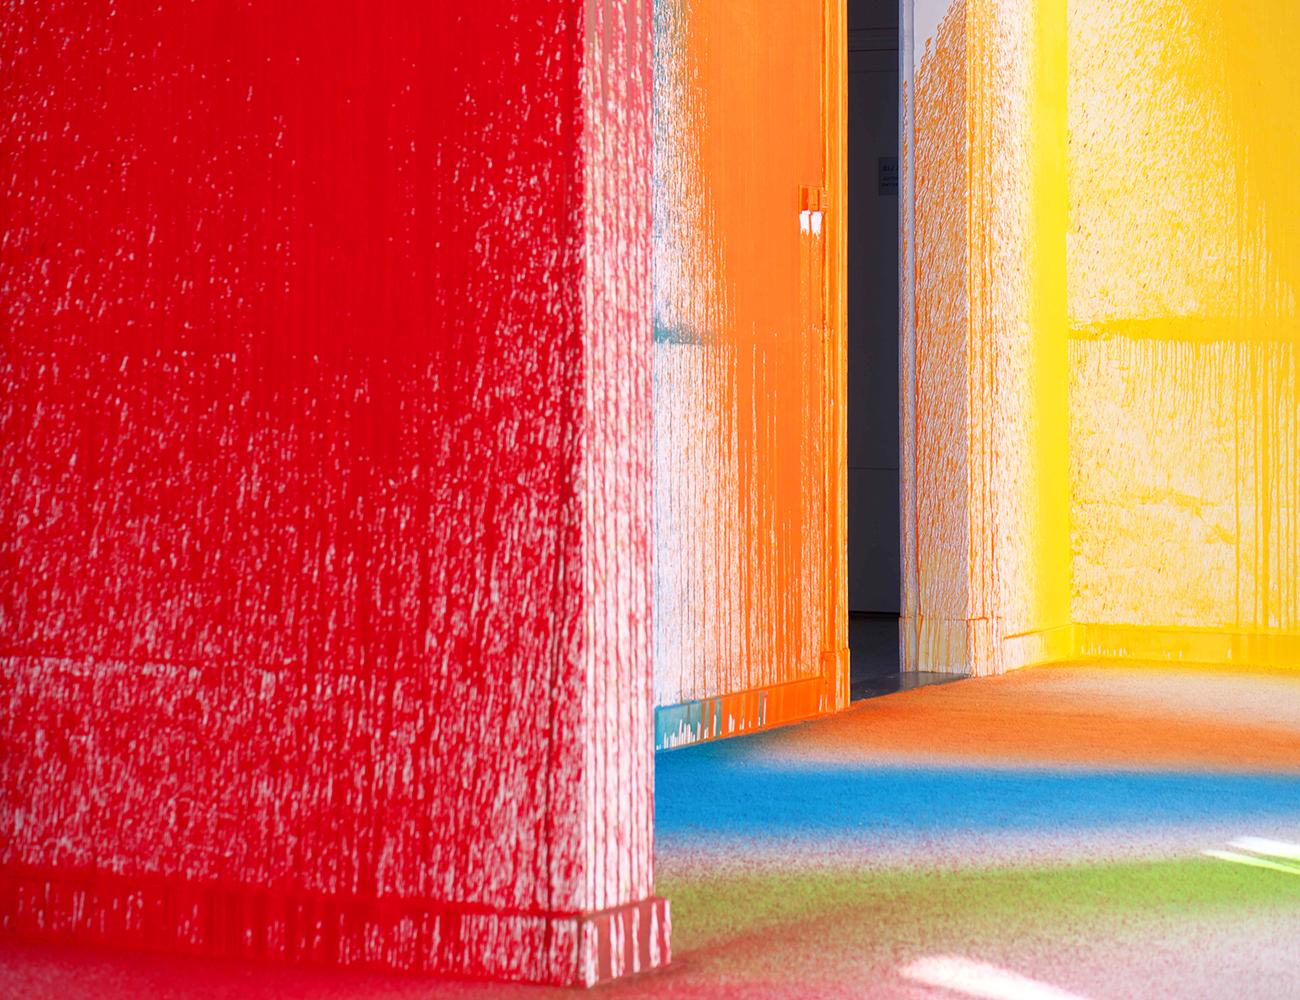 05 © Rutger de Vries, Color Disperser, 2019, Photo by Jan Tengbergen